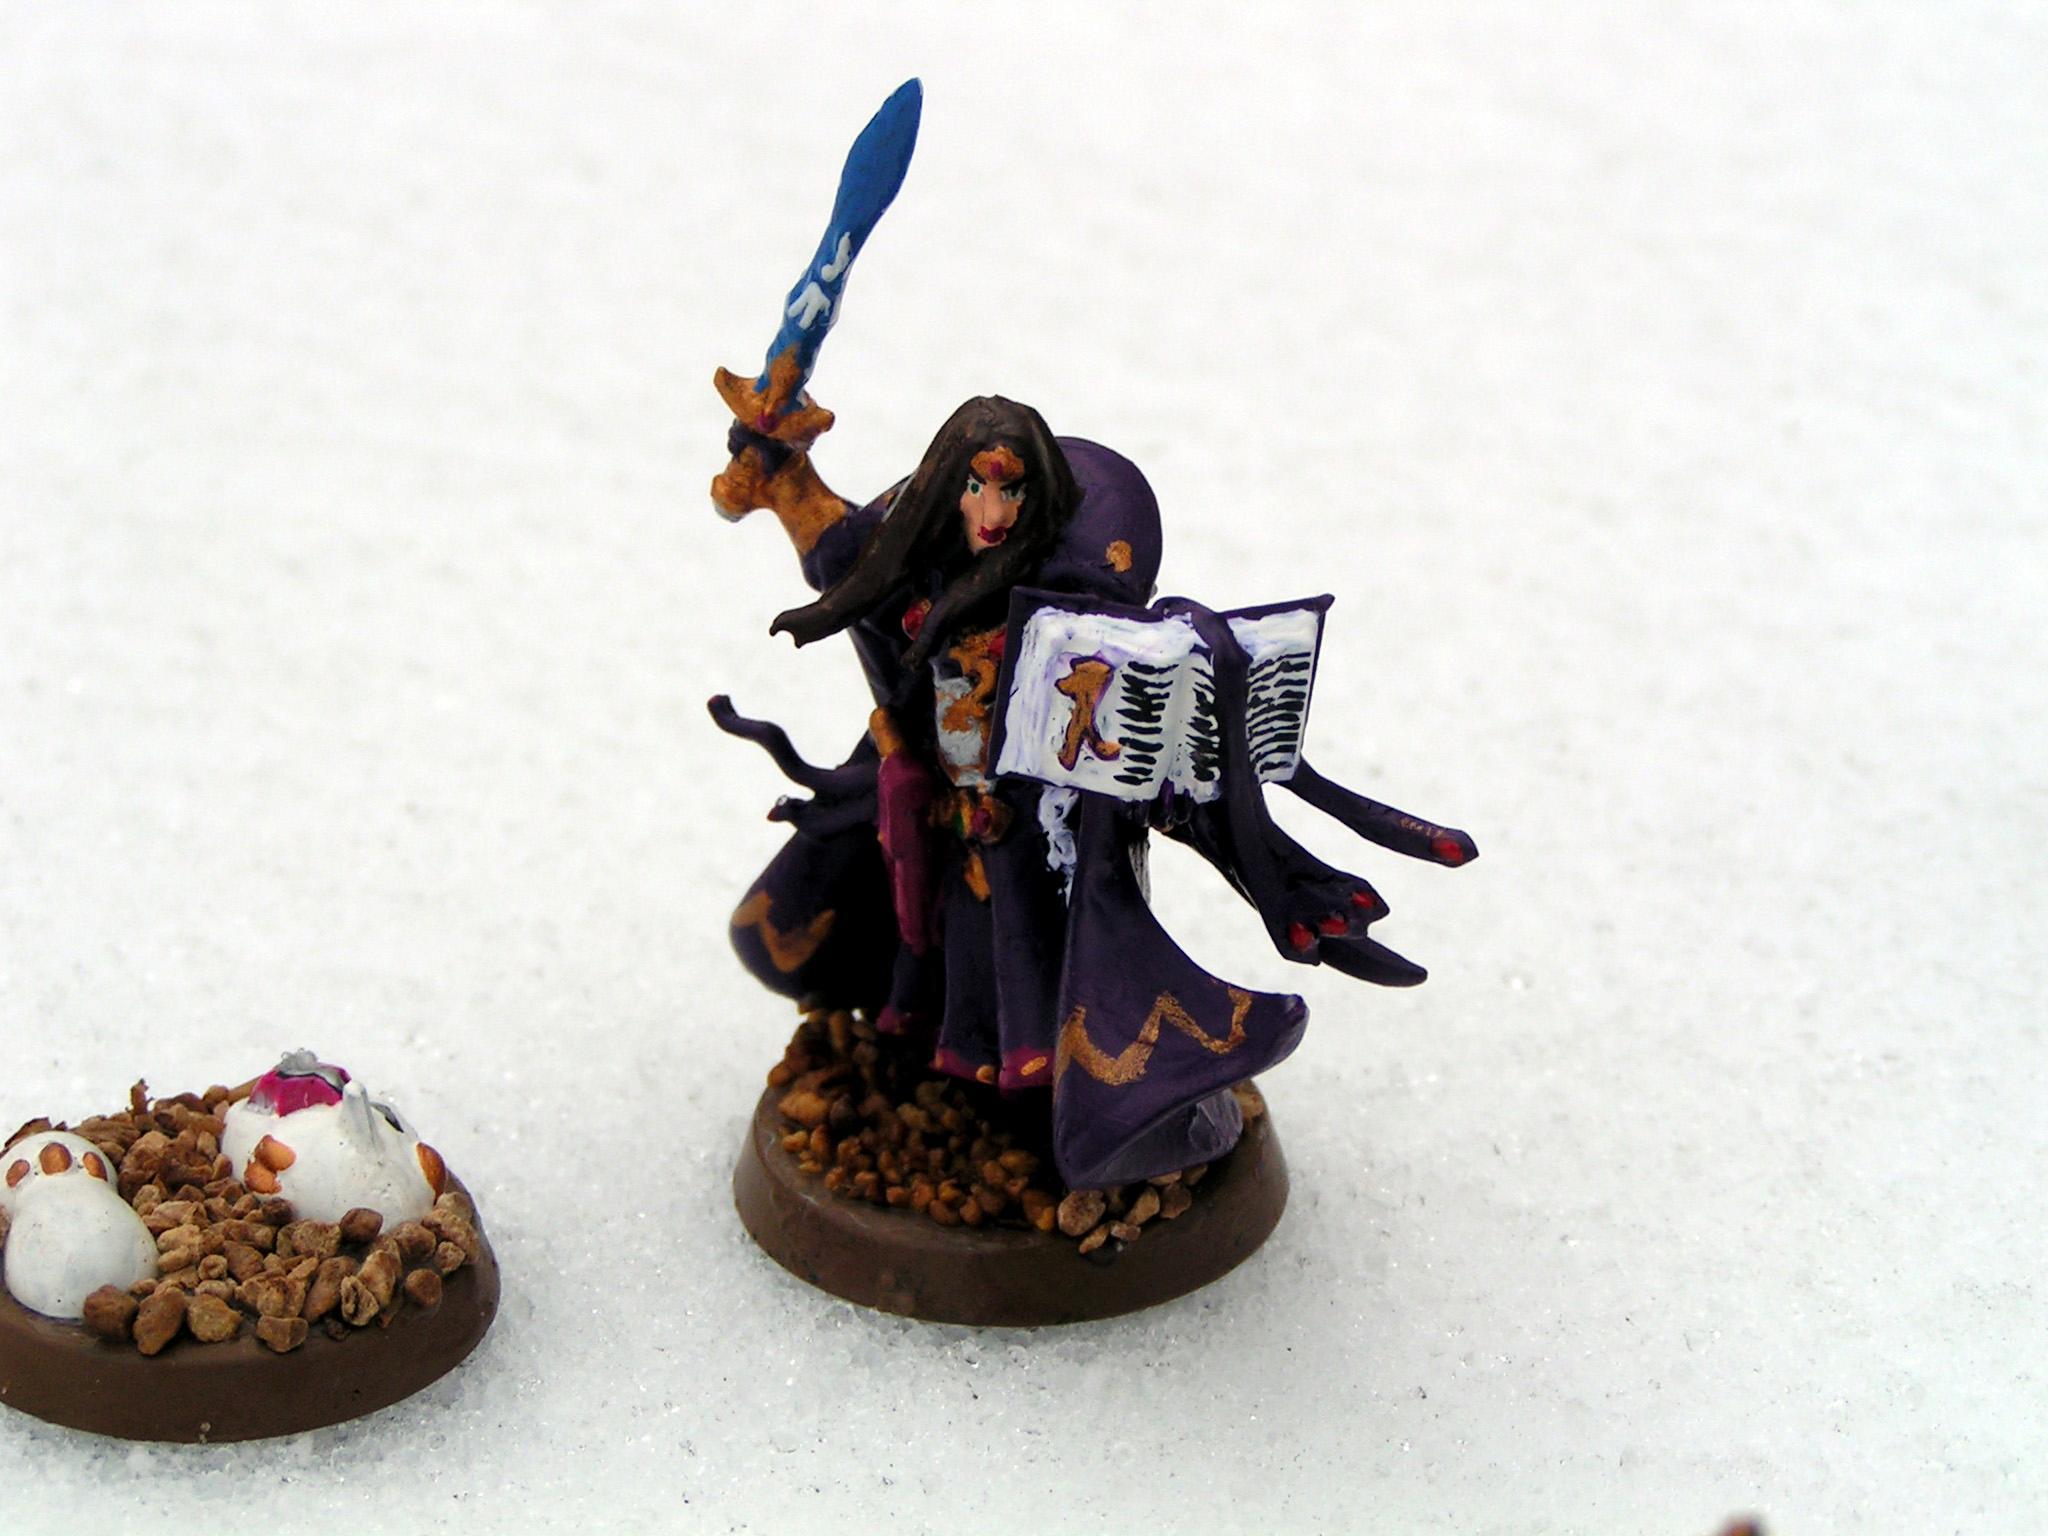 Conversion, Eldar, Farseer, Gyrinx, High Elves, Seer Council, Warlock